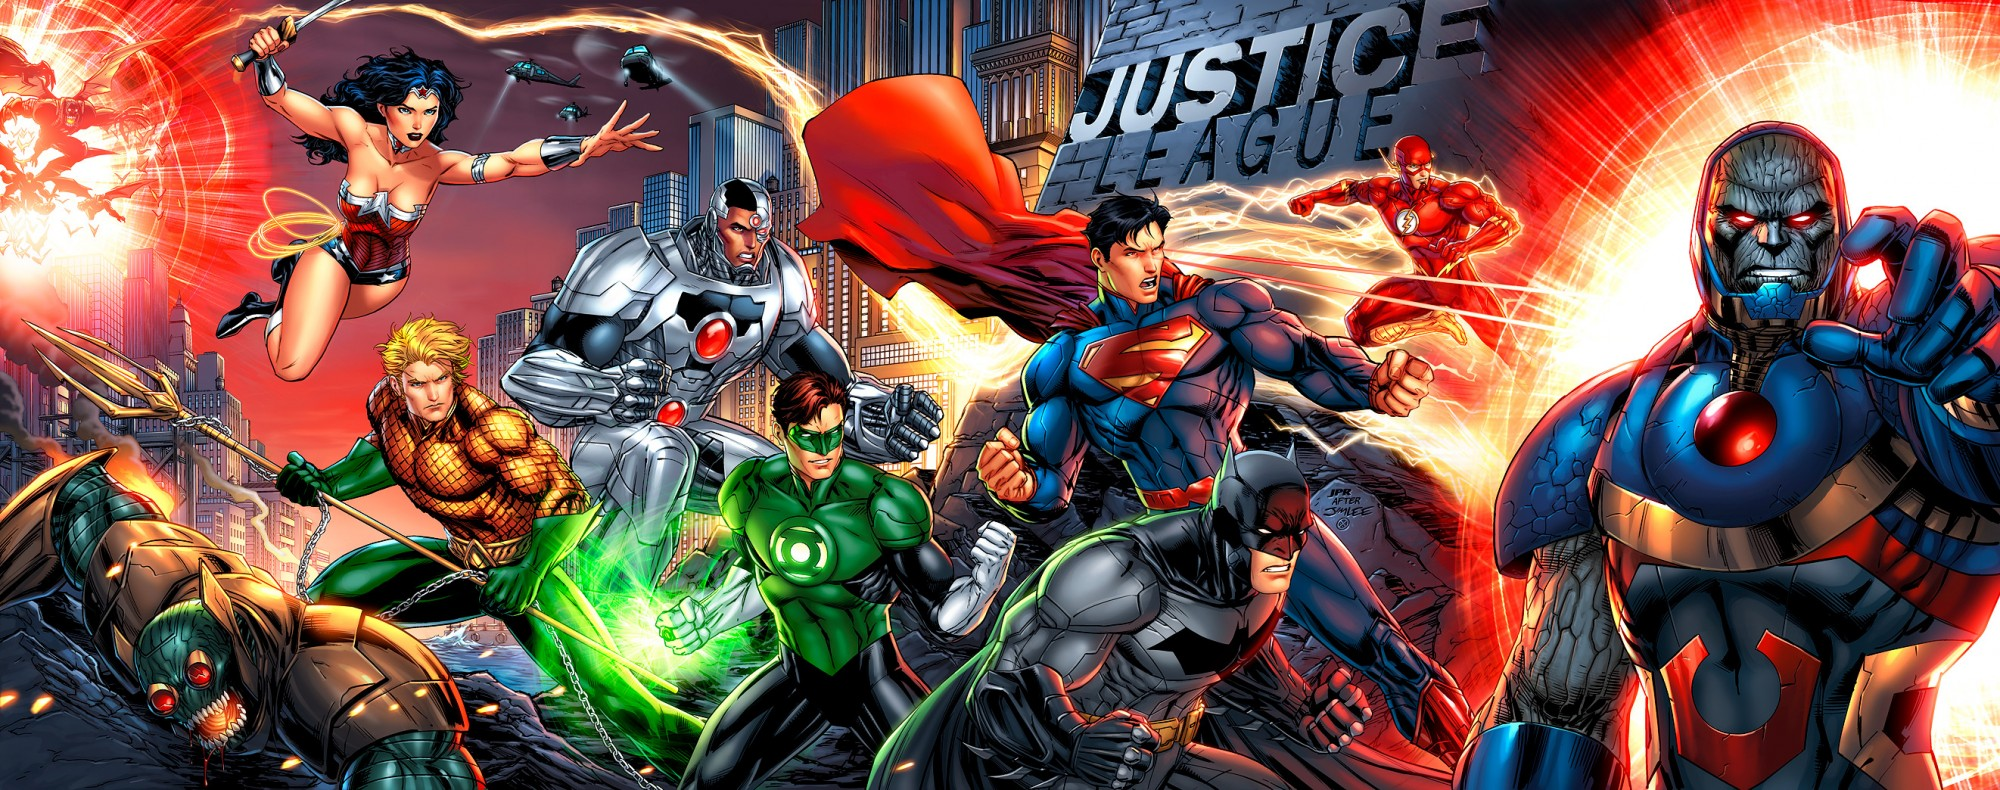 The Justice League in Batman v Superman!